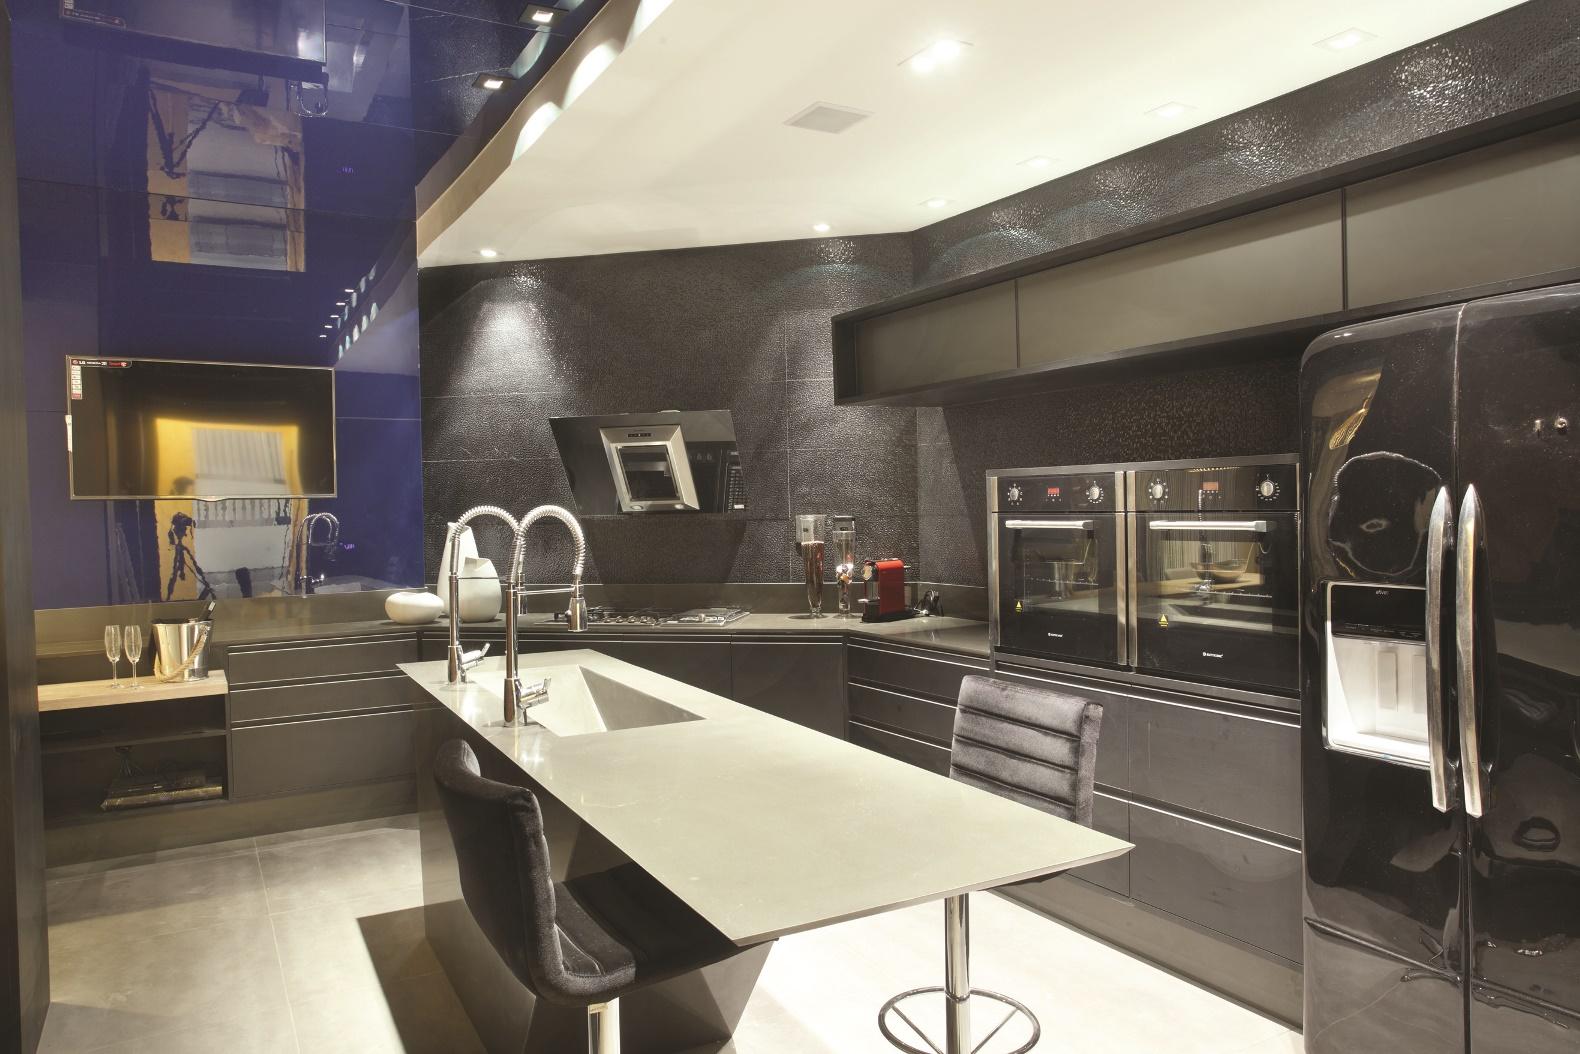 Casa Design e seus destaques